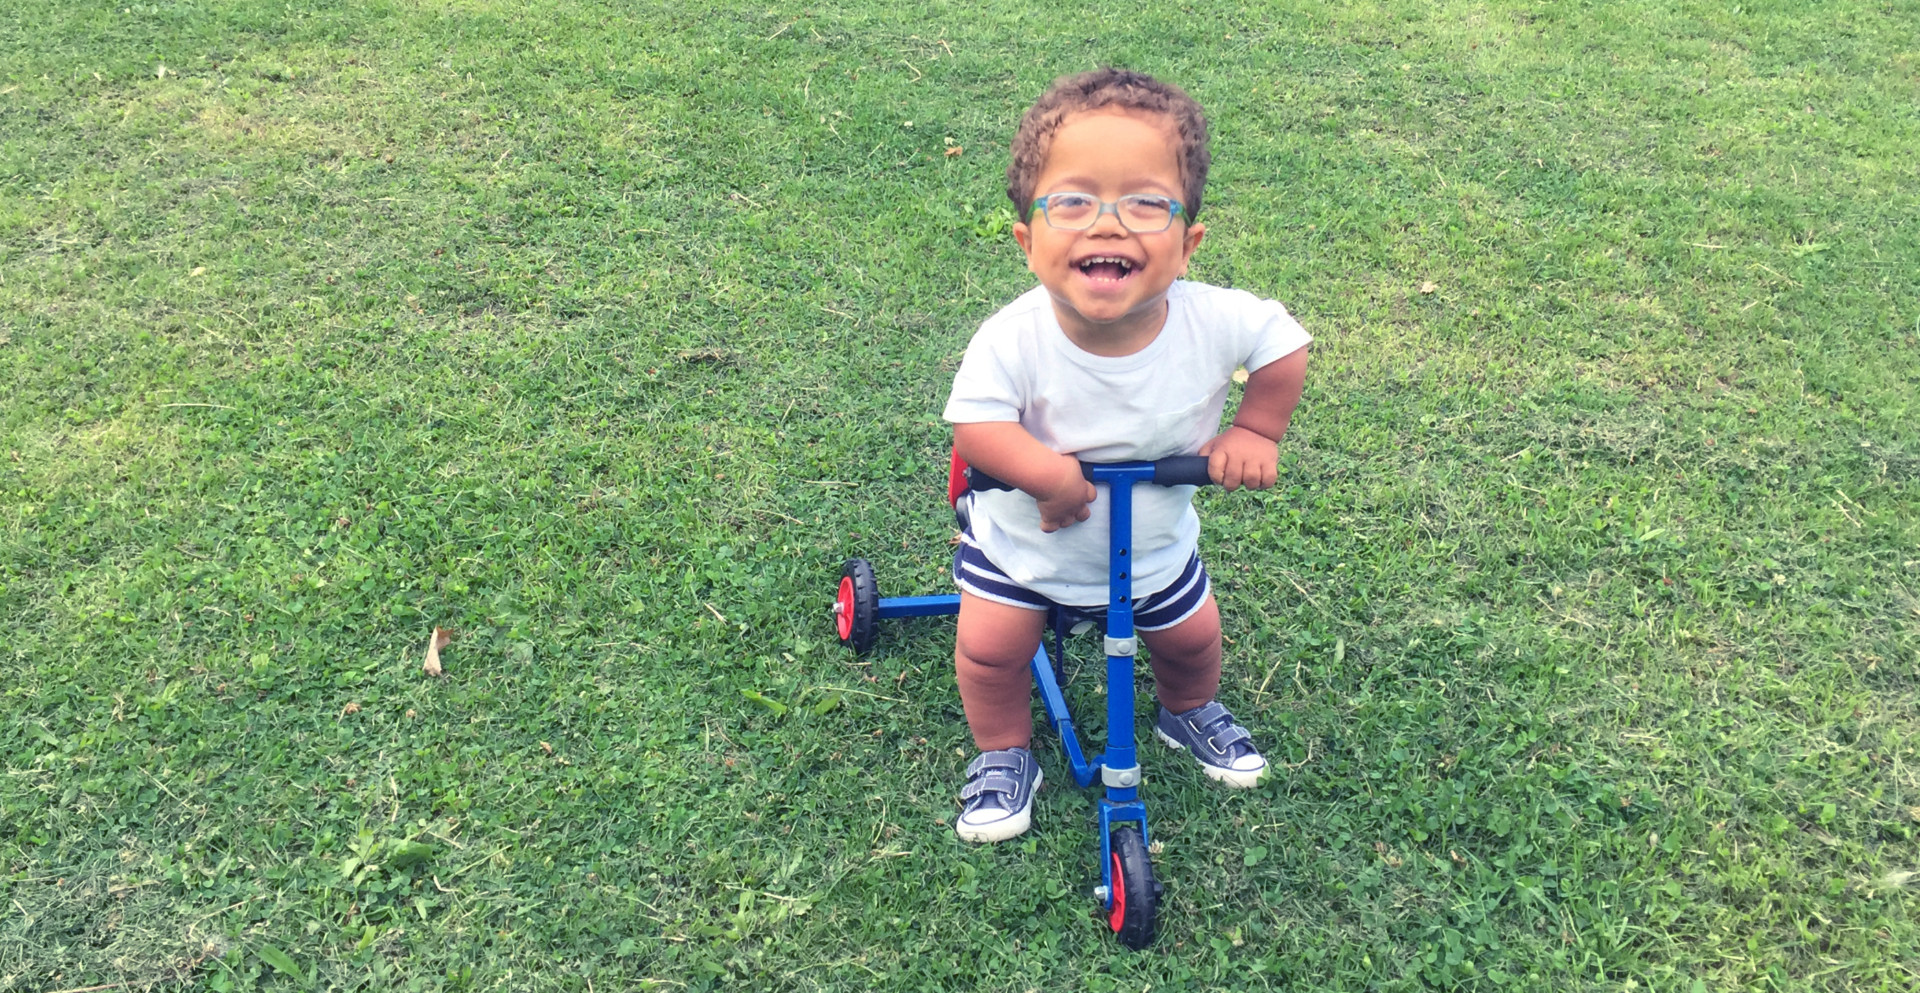 Freddie in a field with his Sit 'n' Ride tricycle